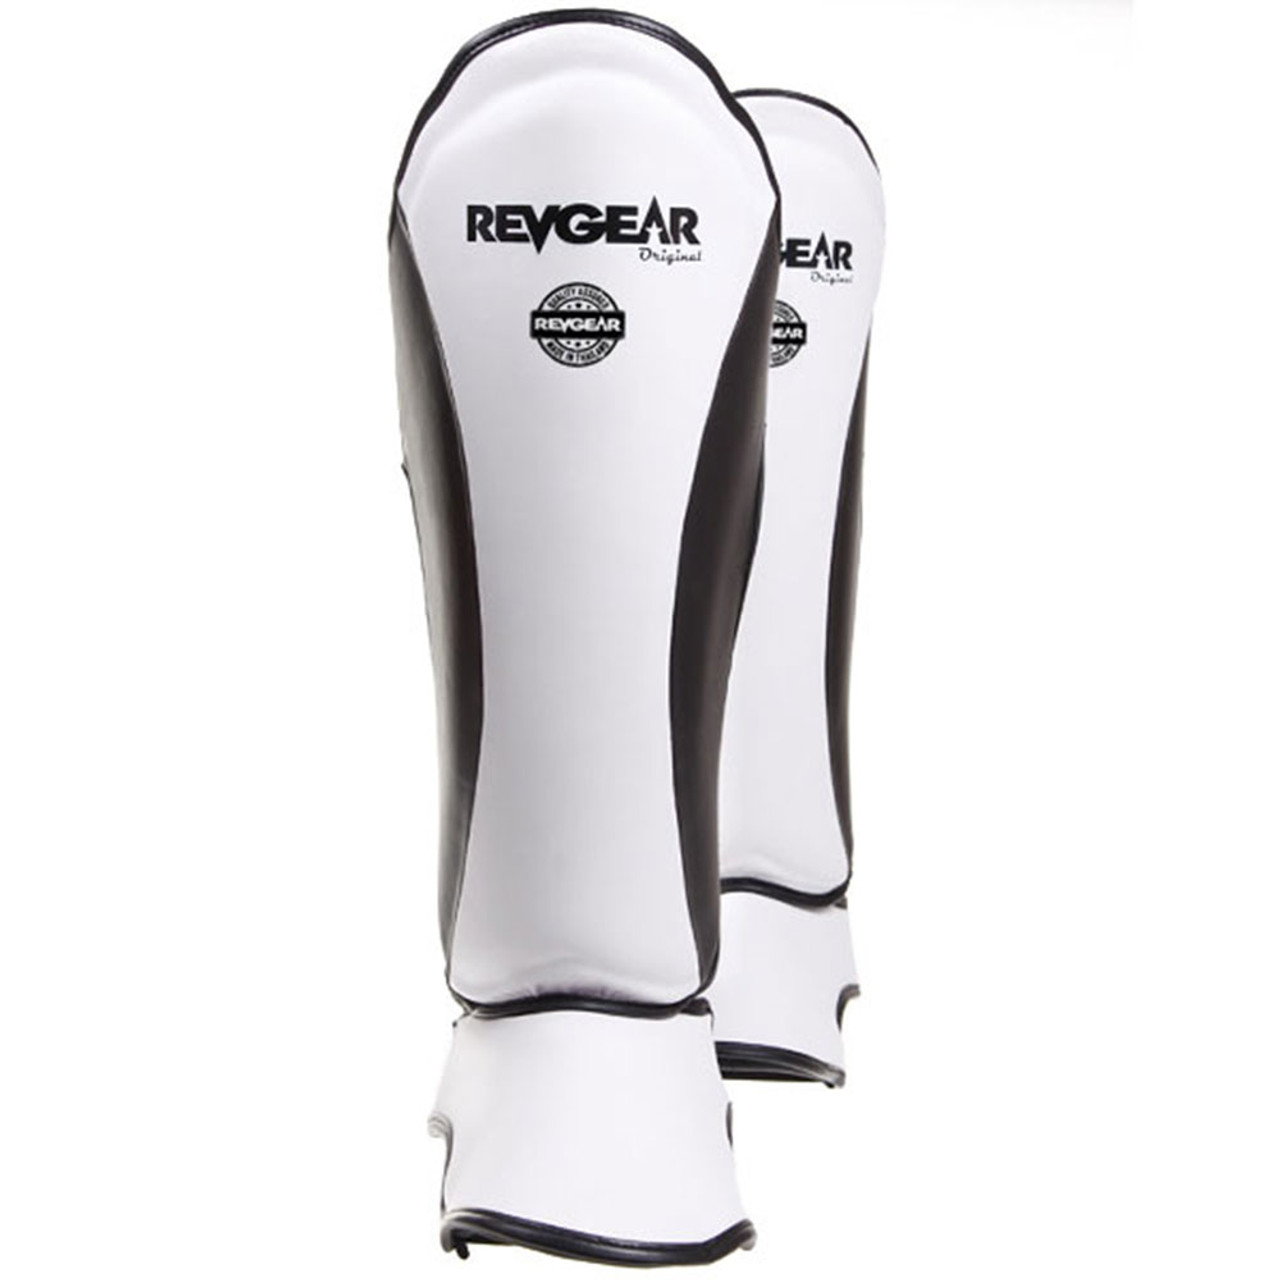 Revgear Original Thai Shin Guards - White